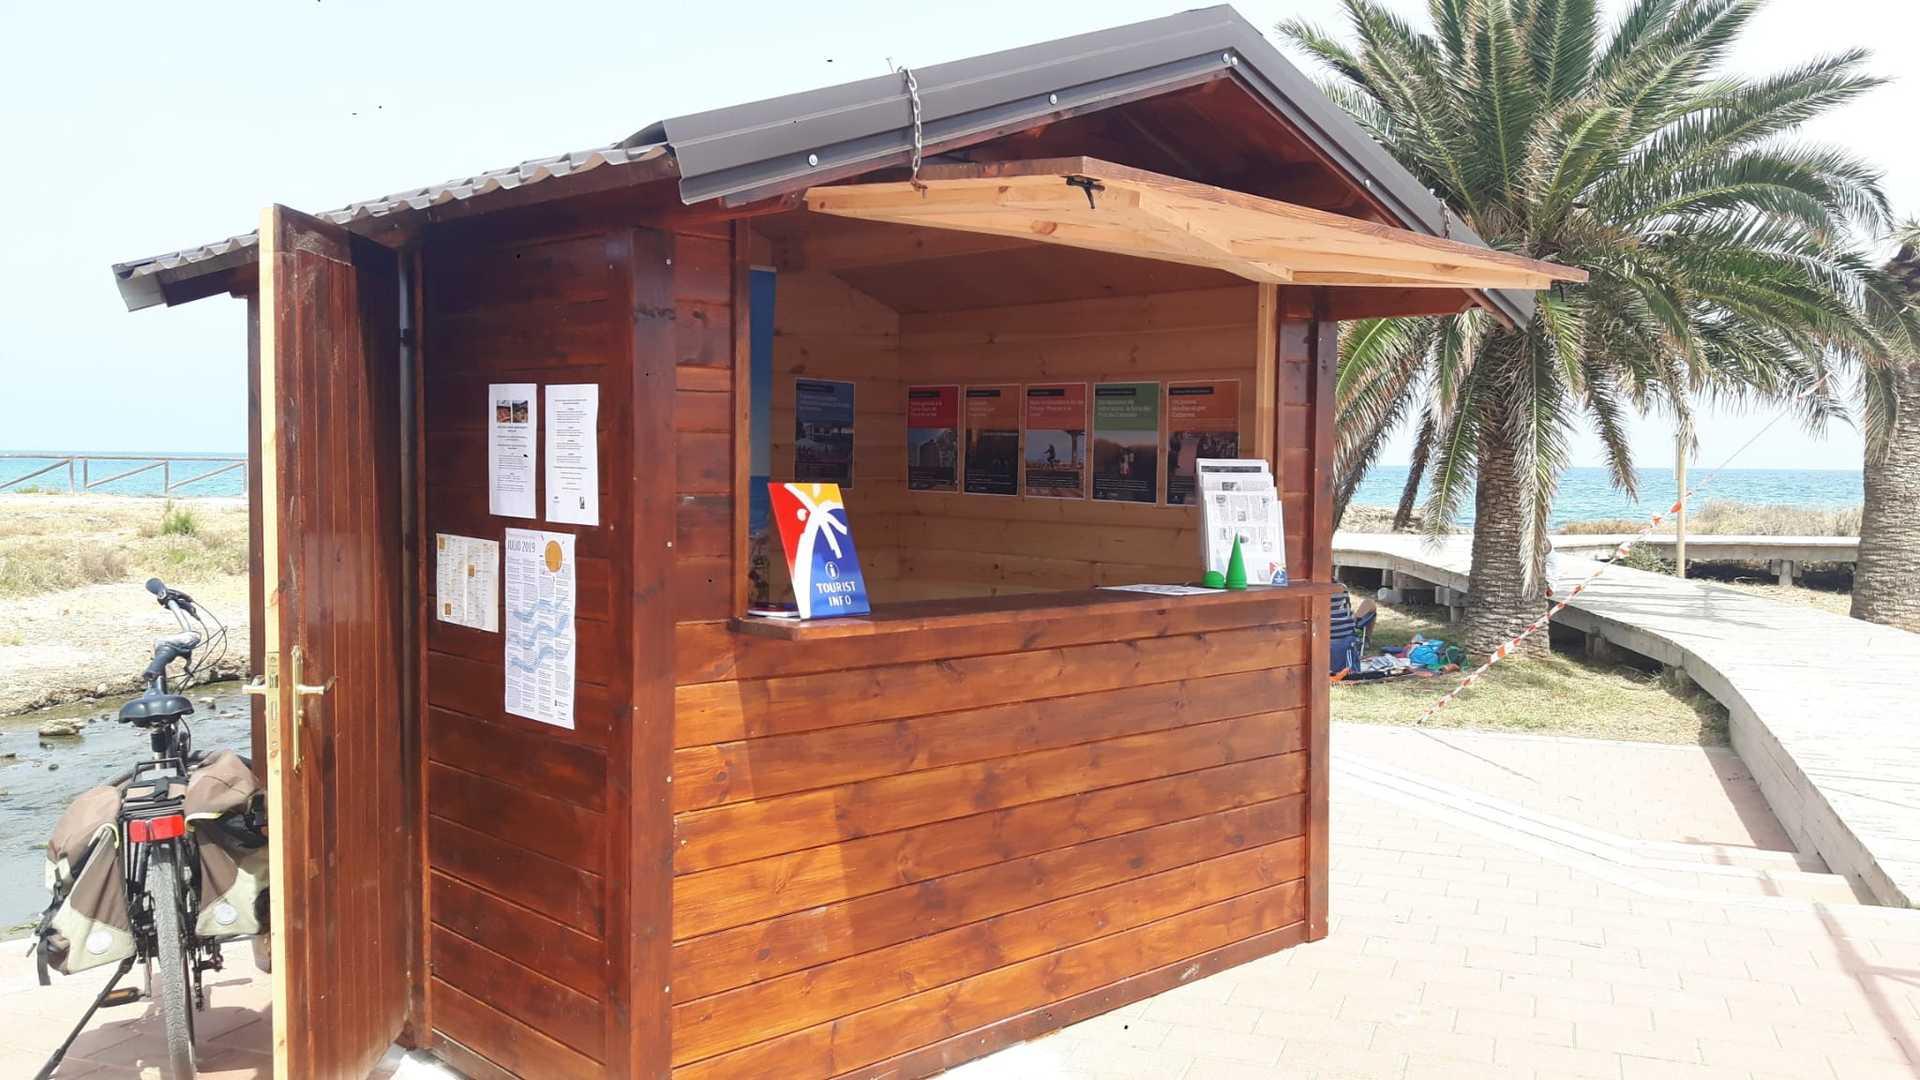 TOURIST INFO CABANES - TORRE LA SAL